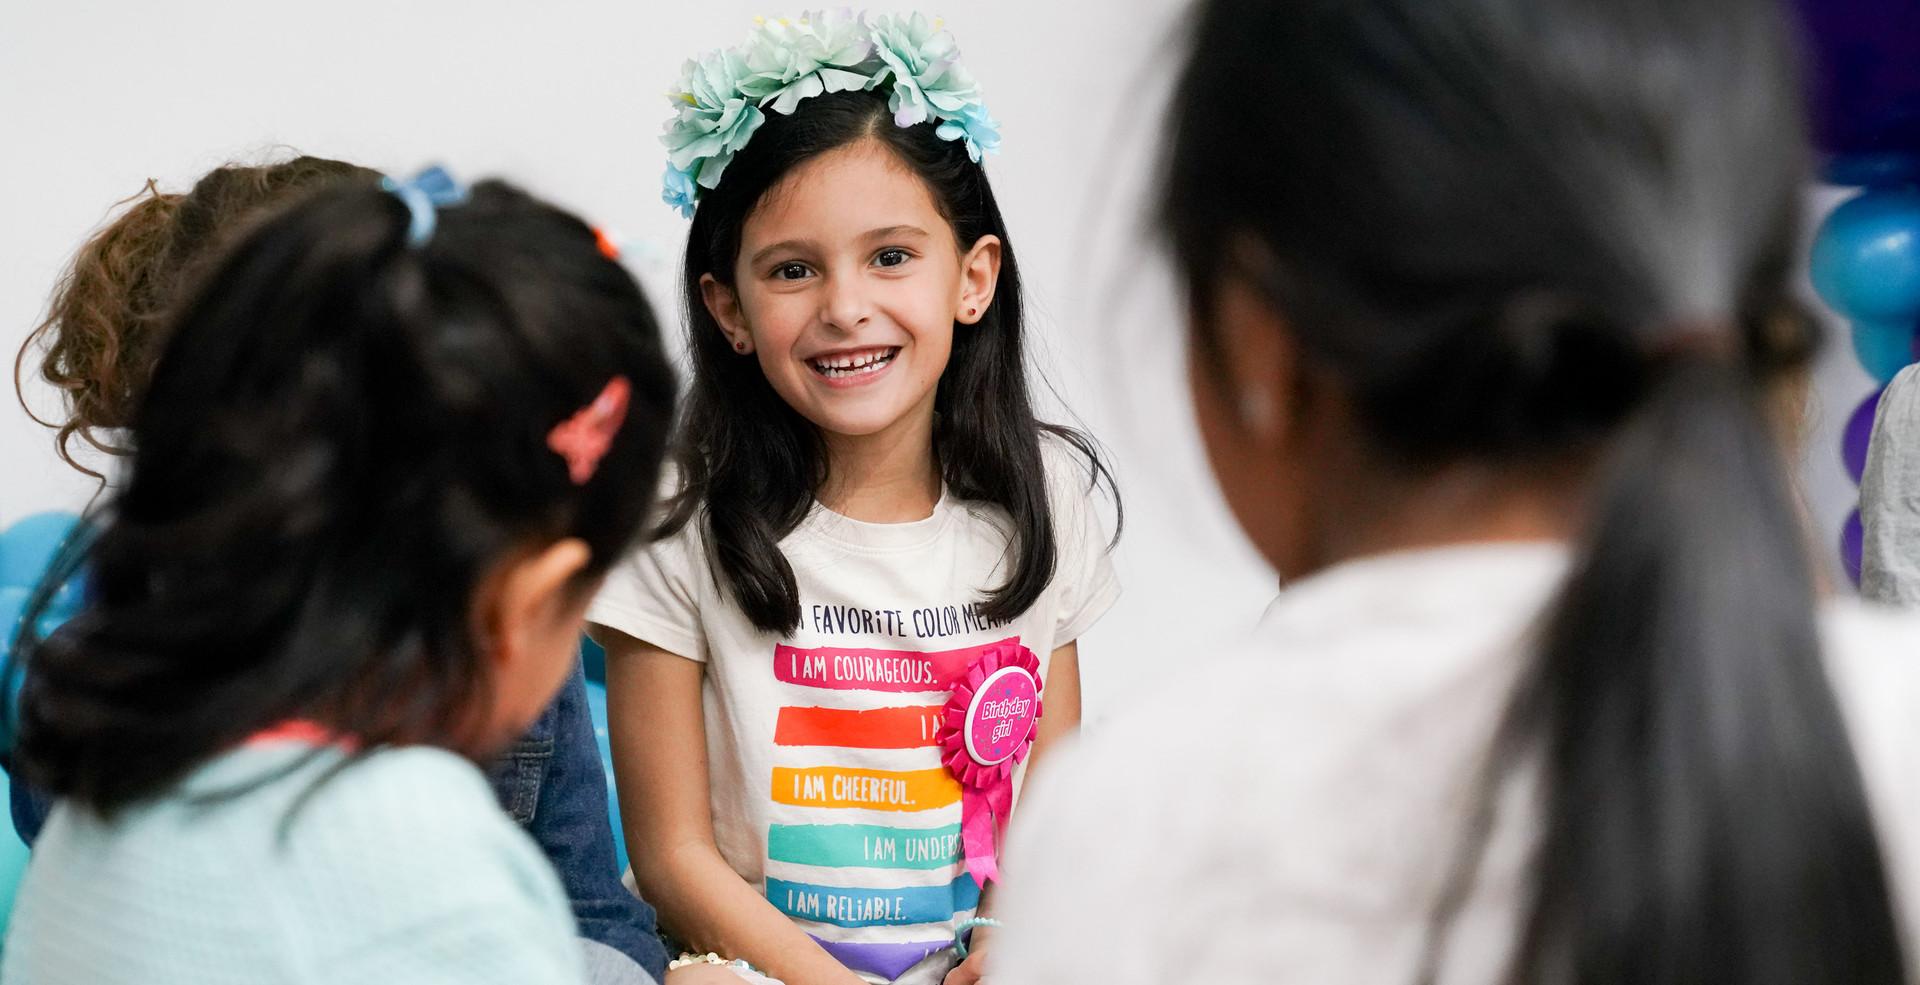 Childrens Party Birthday Girl.jpg